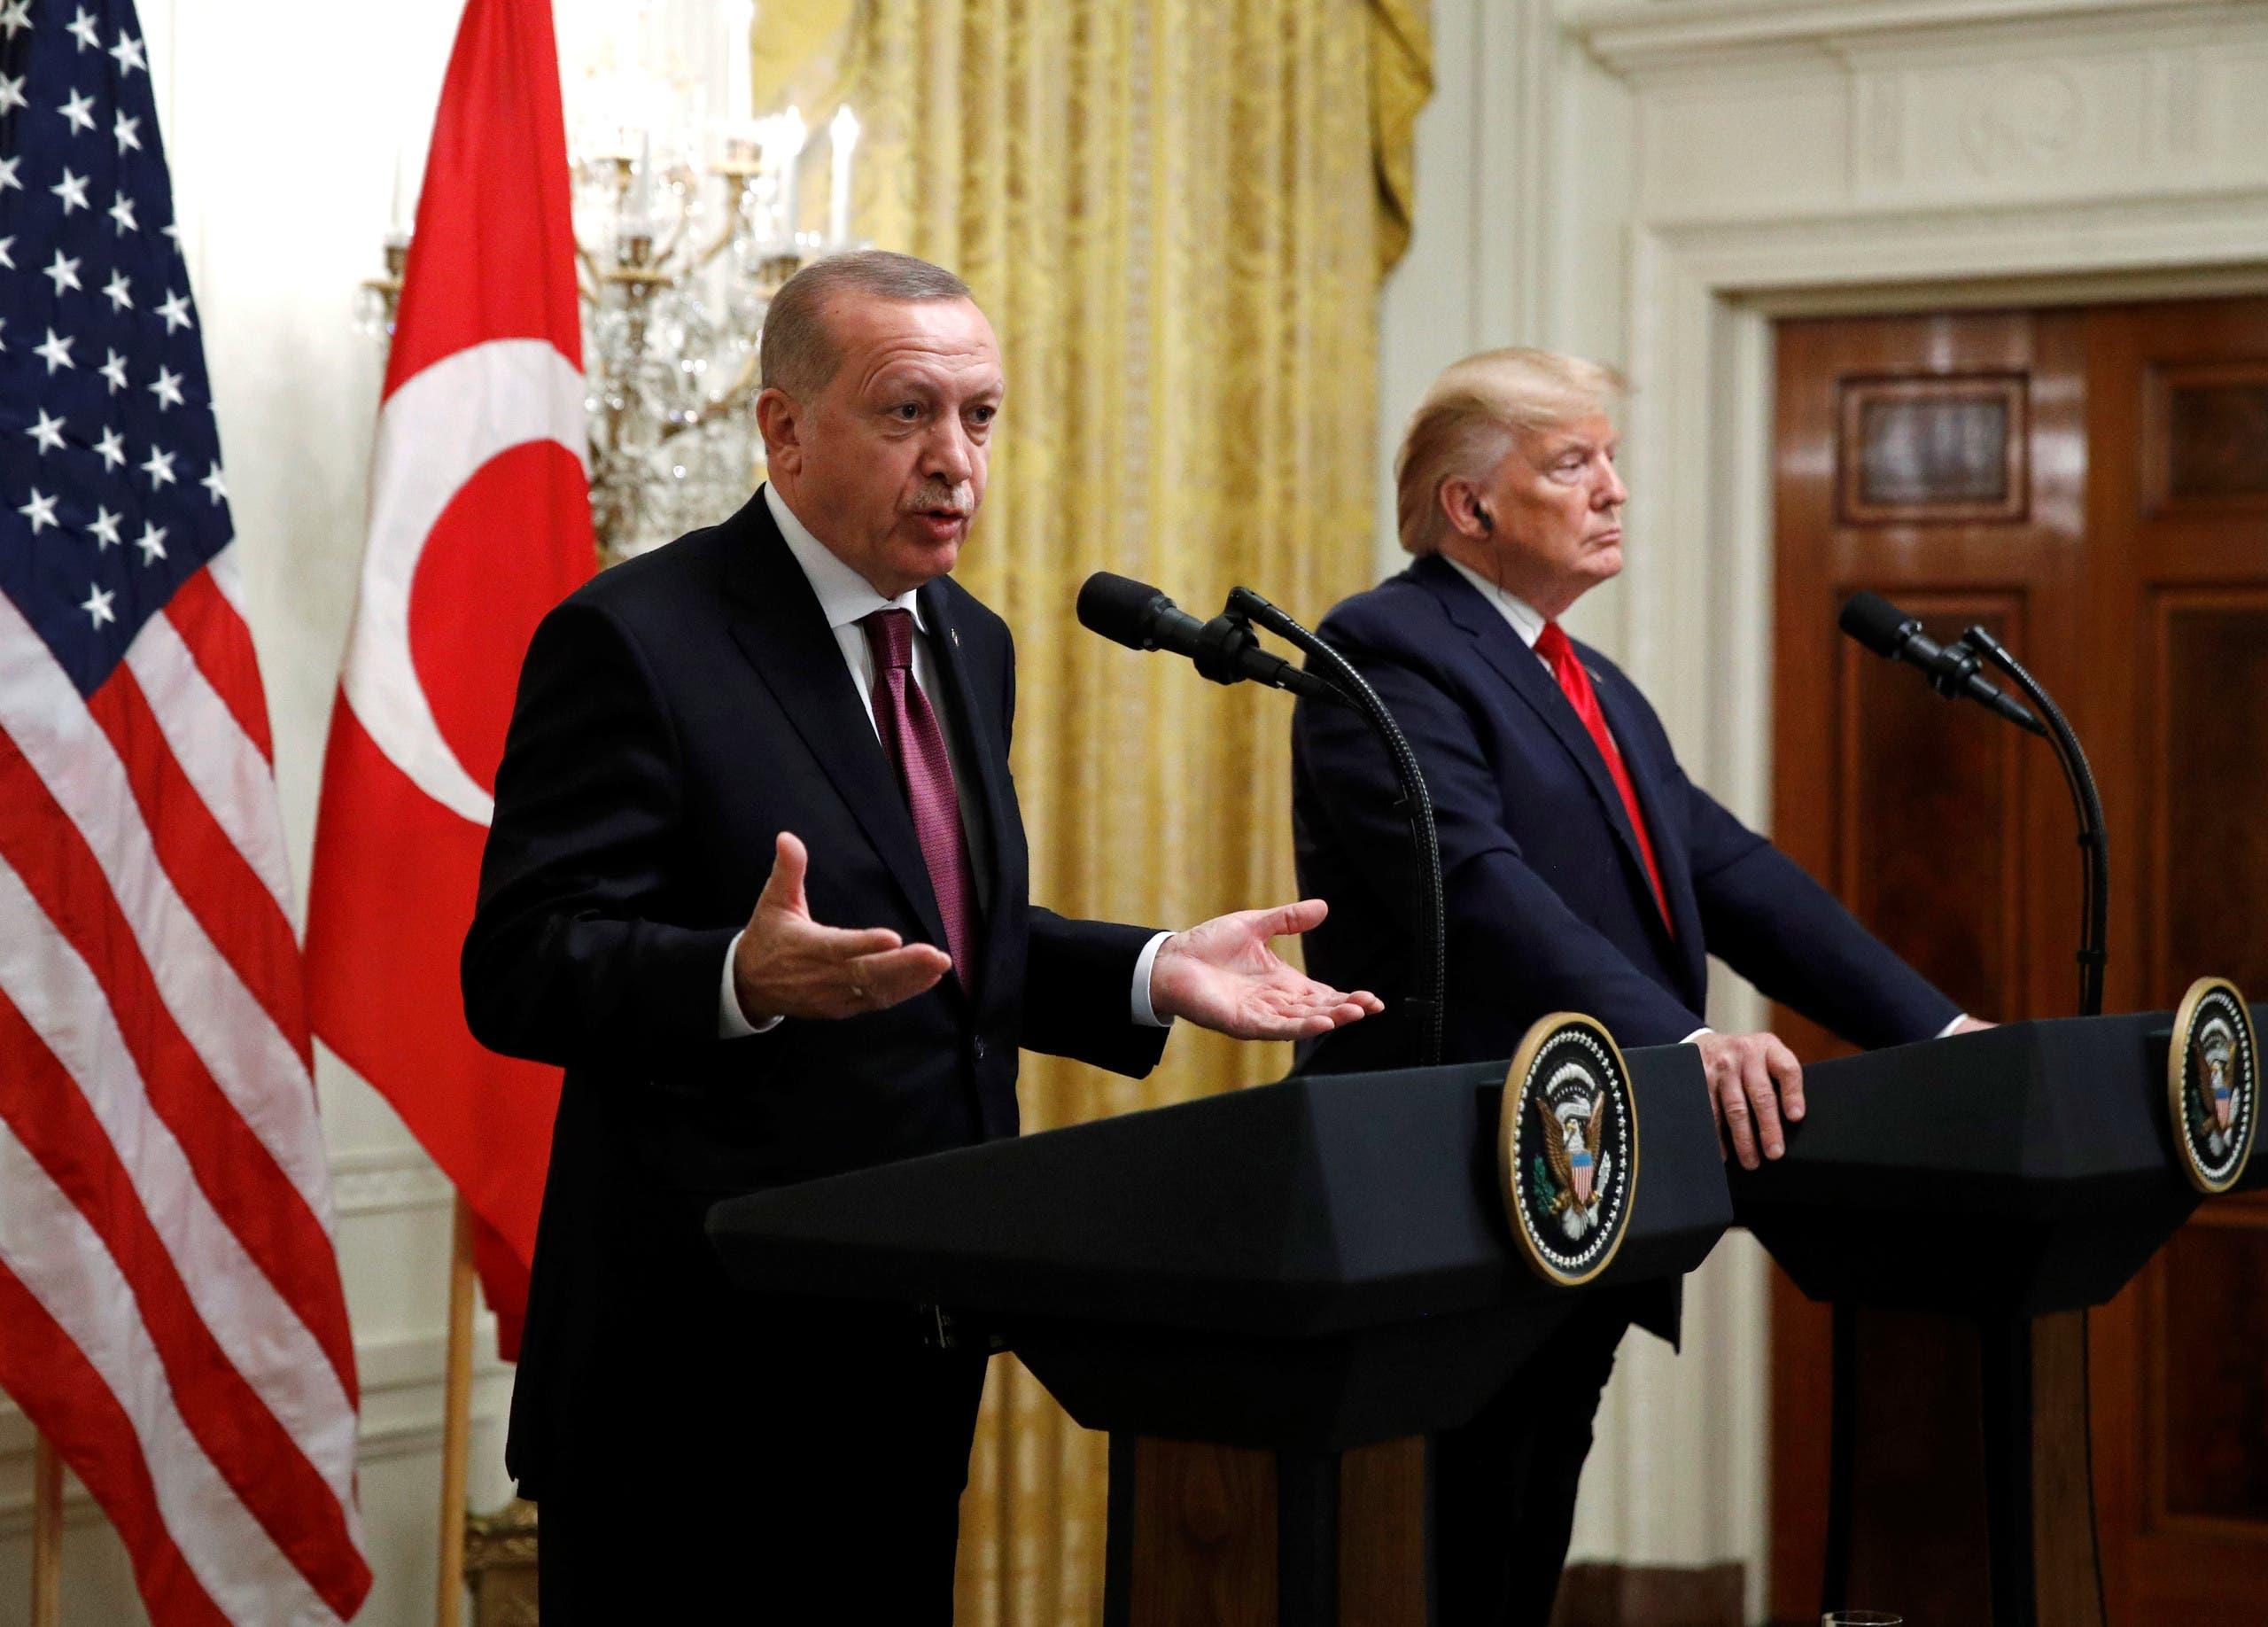 Turkish President Recep Tayyip Erdogan in the East Room of the White House, Wednesday, Nov. 13, 2019, in Washington. (AP)